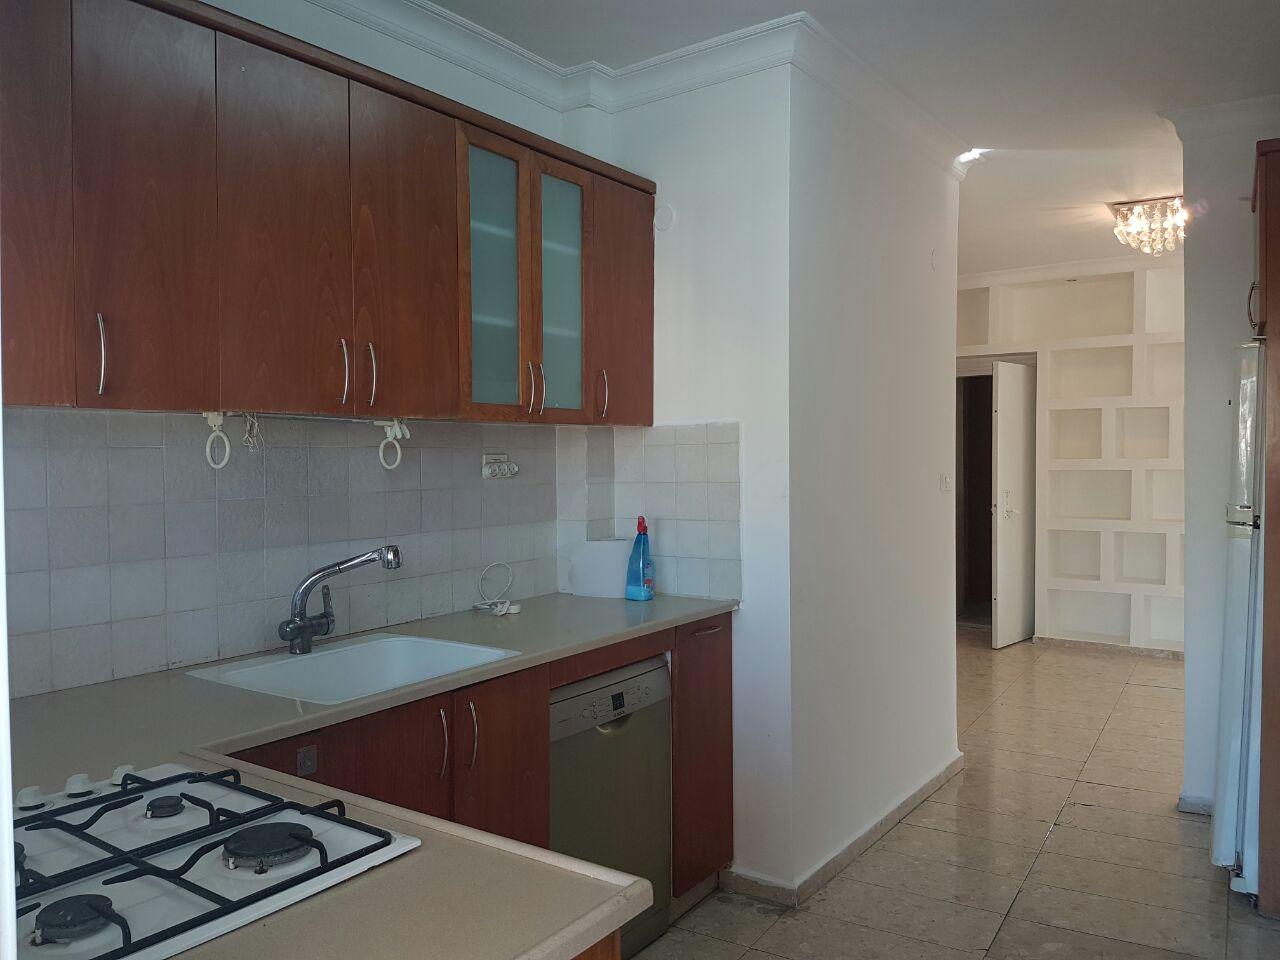 For Rent: Spacious 4 Bedroom Apartments on Rachel Emainu in Katamon ...